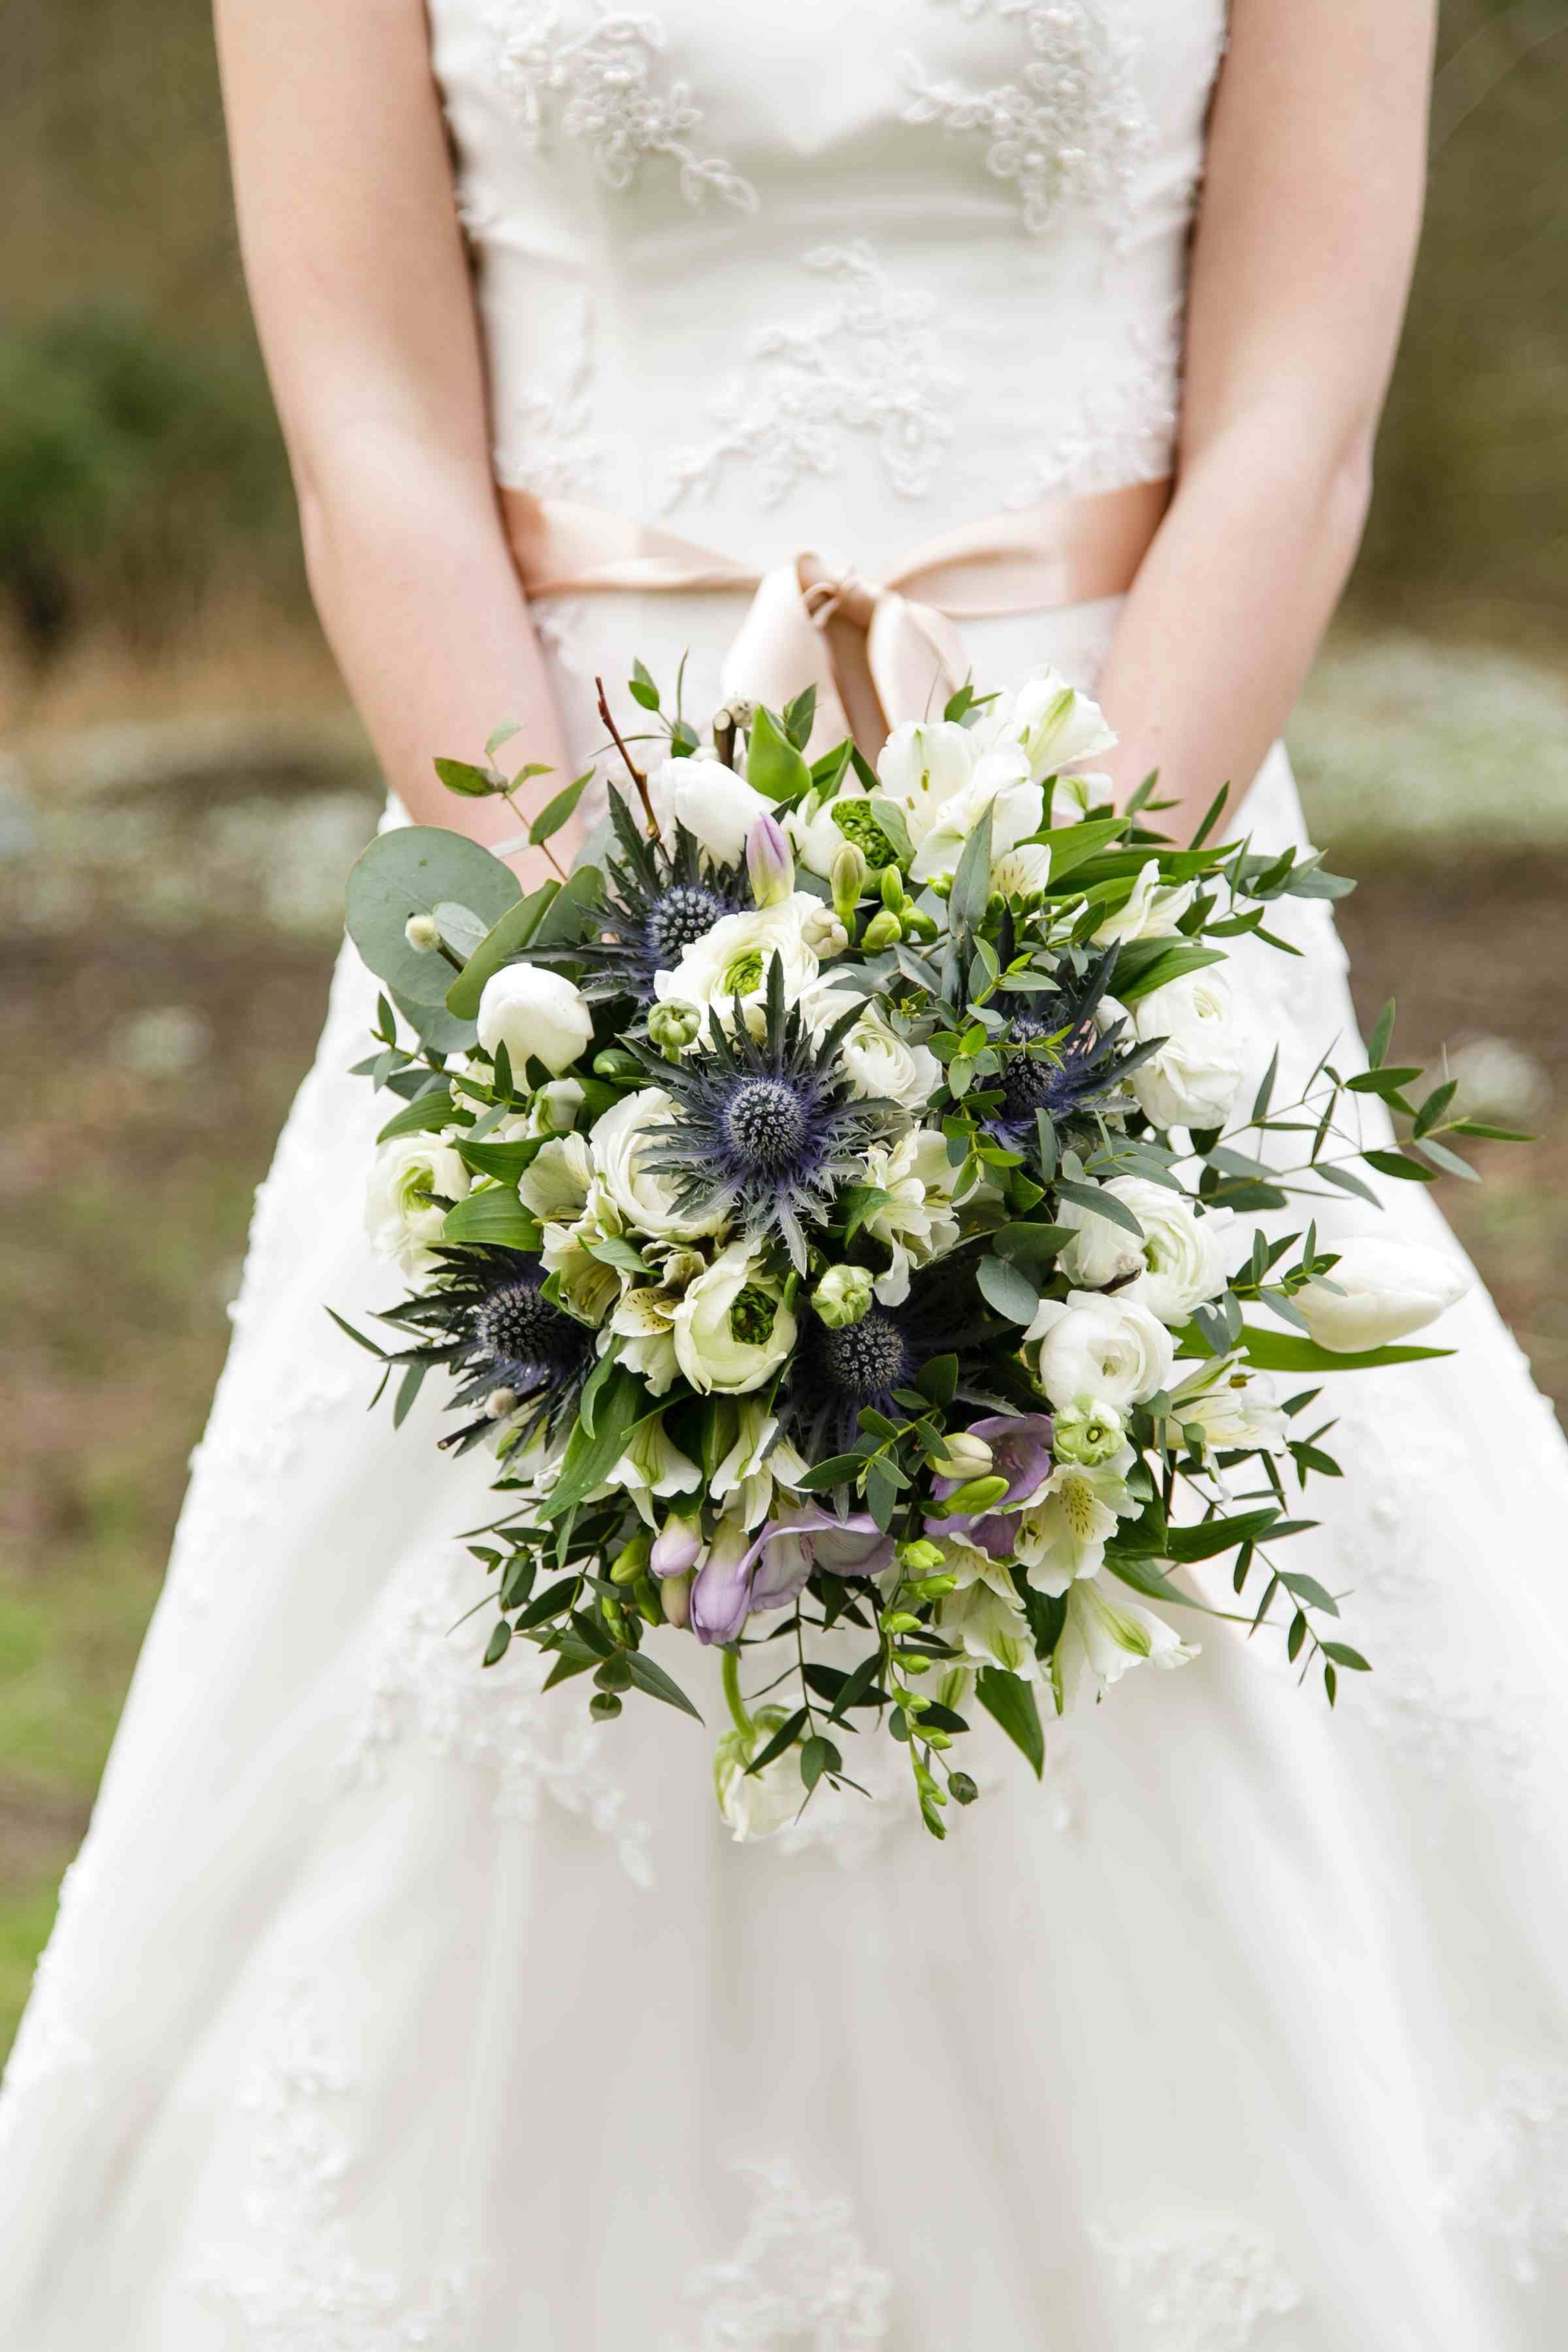 february wedding flowers | february wedding flowers in 2019